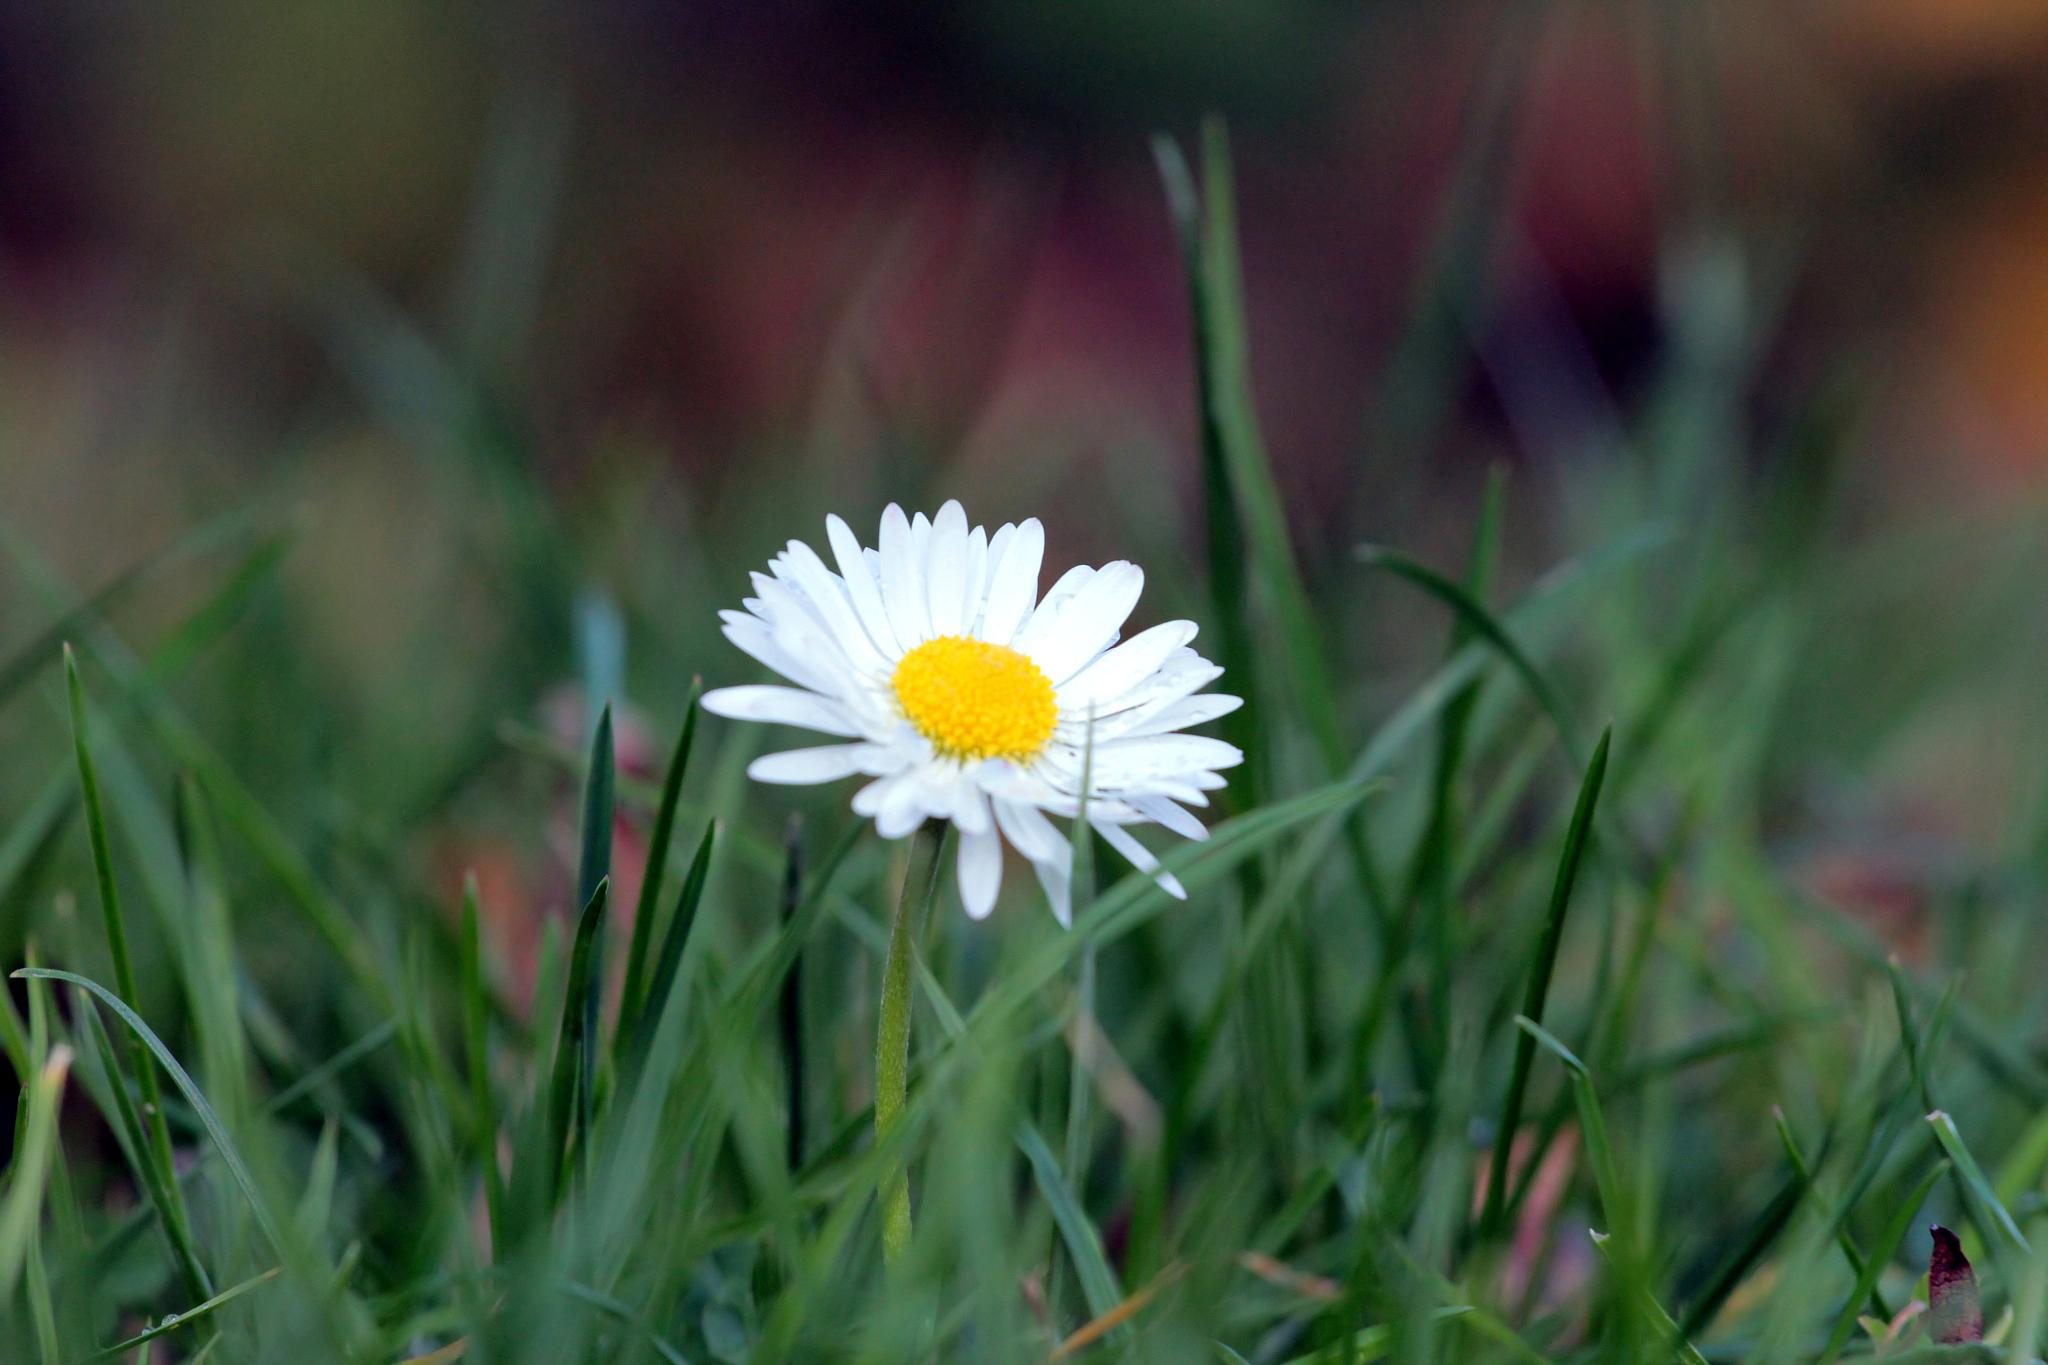 macro world in grass by Stanislaw Bomba